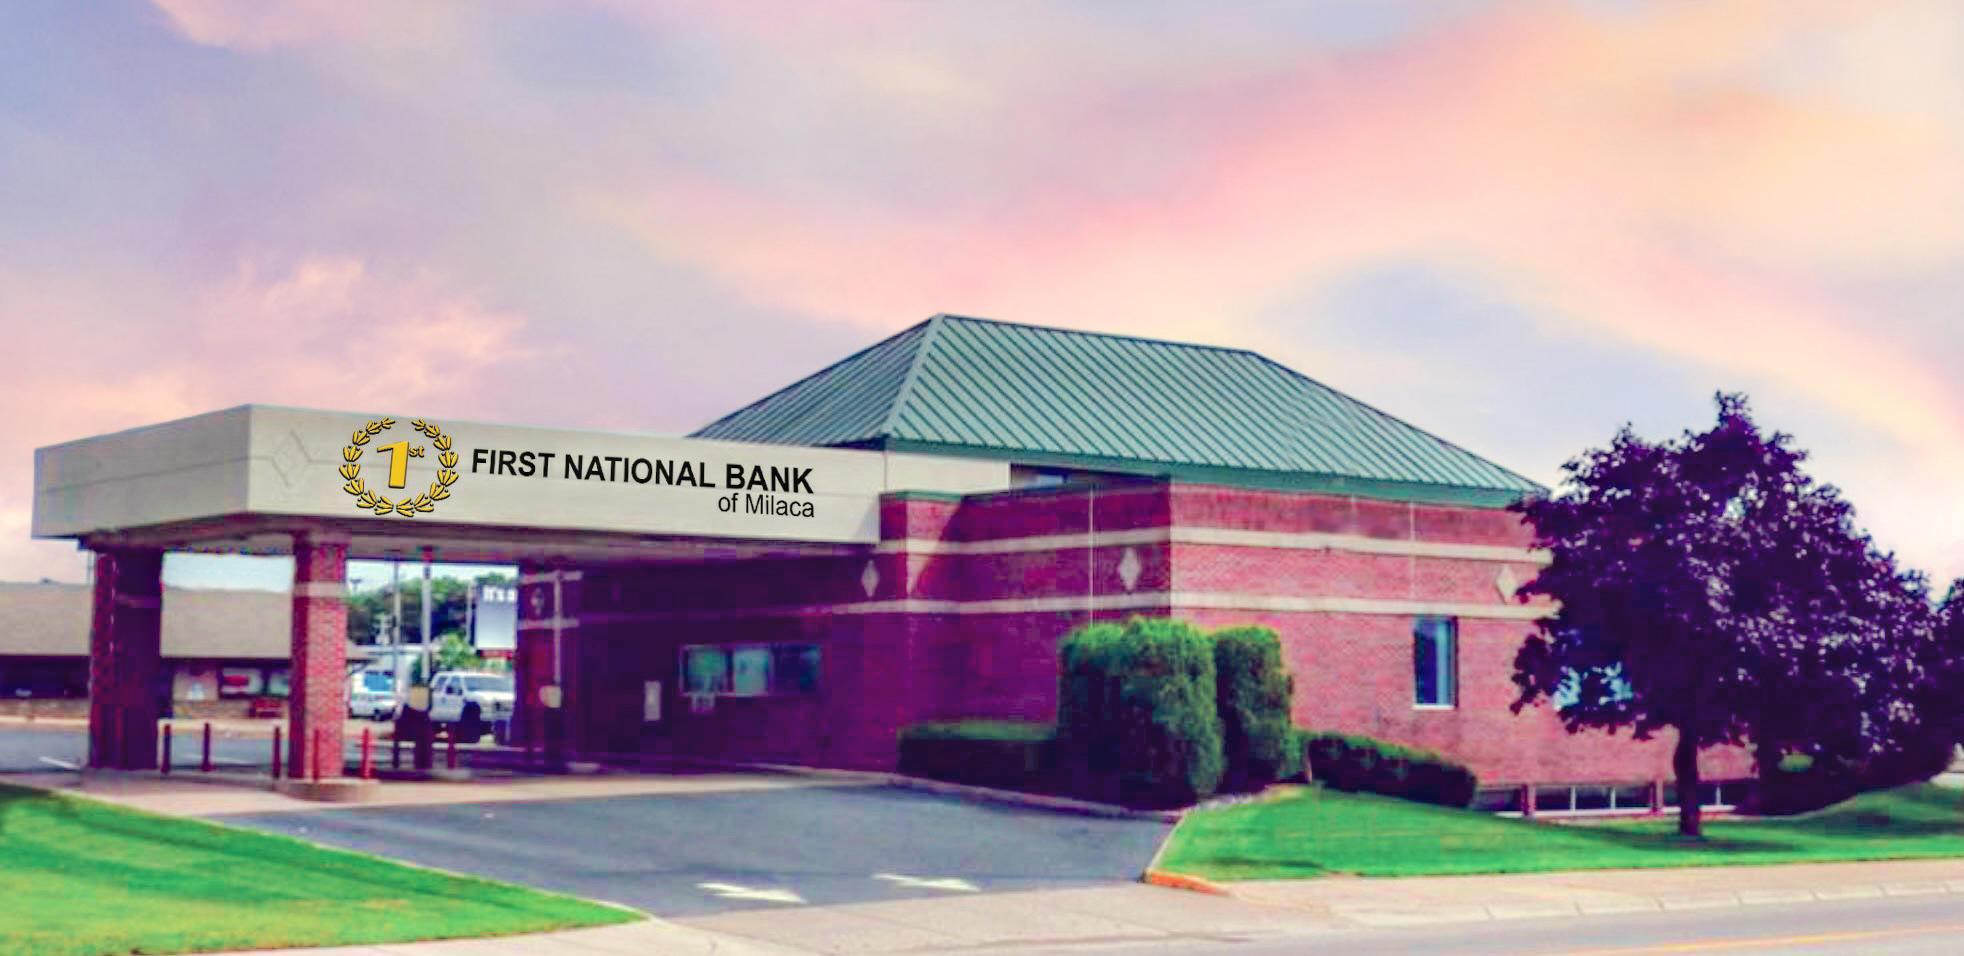 First National Bank of Milaca image 5